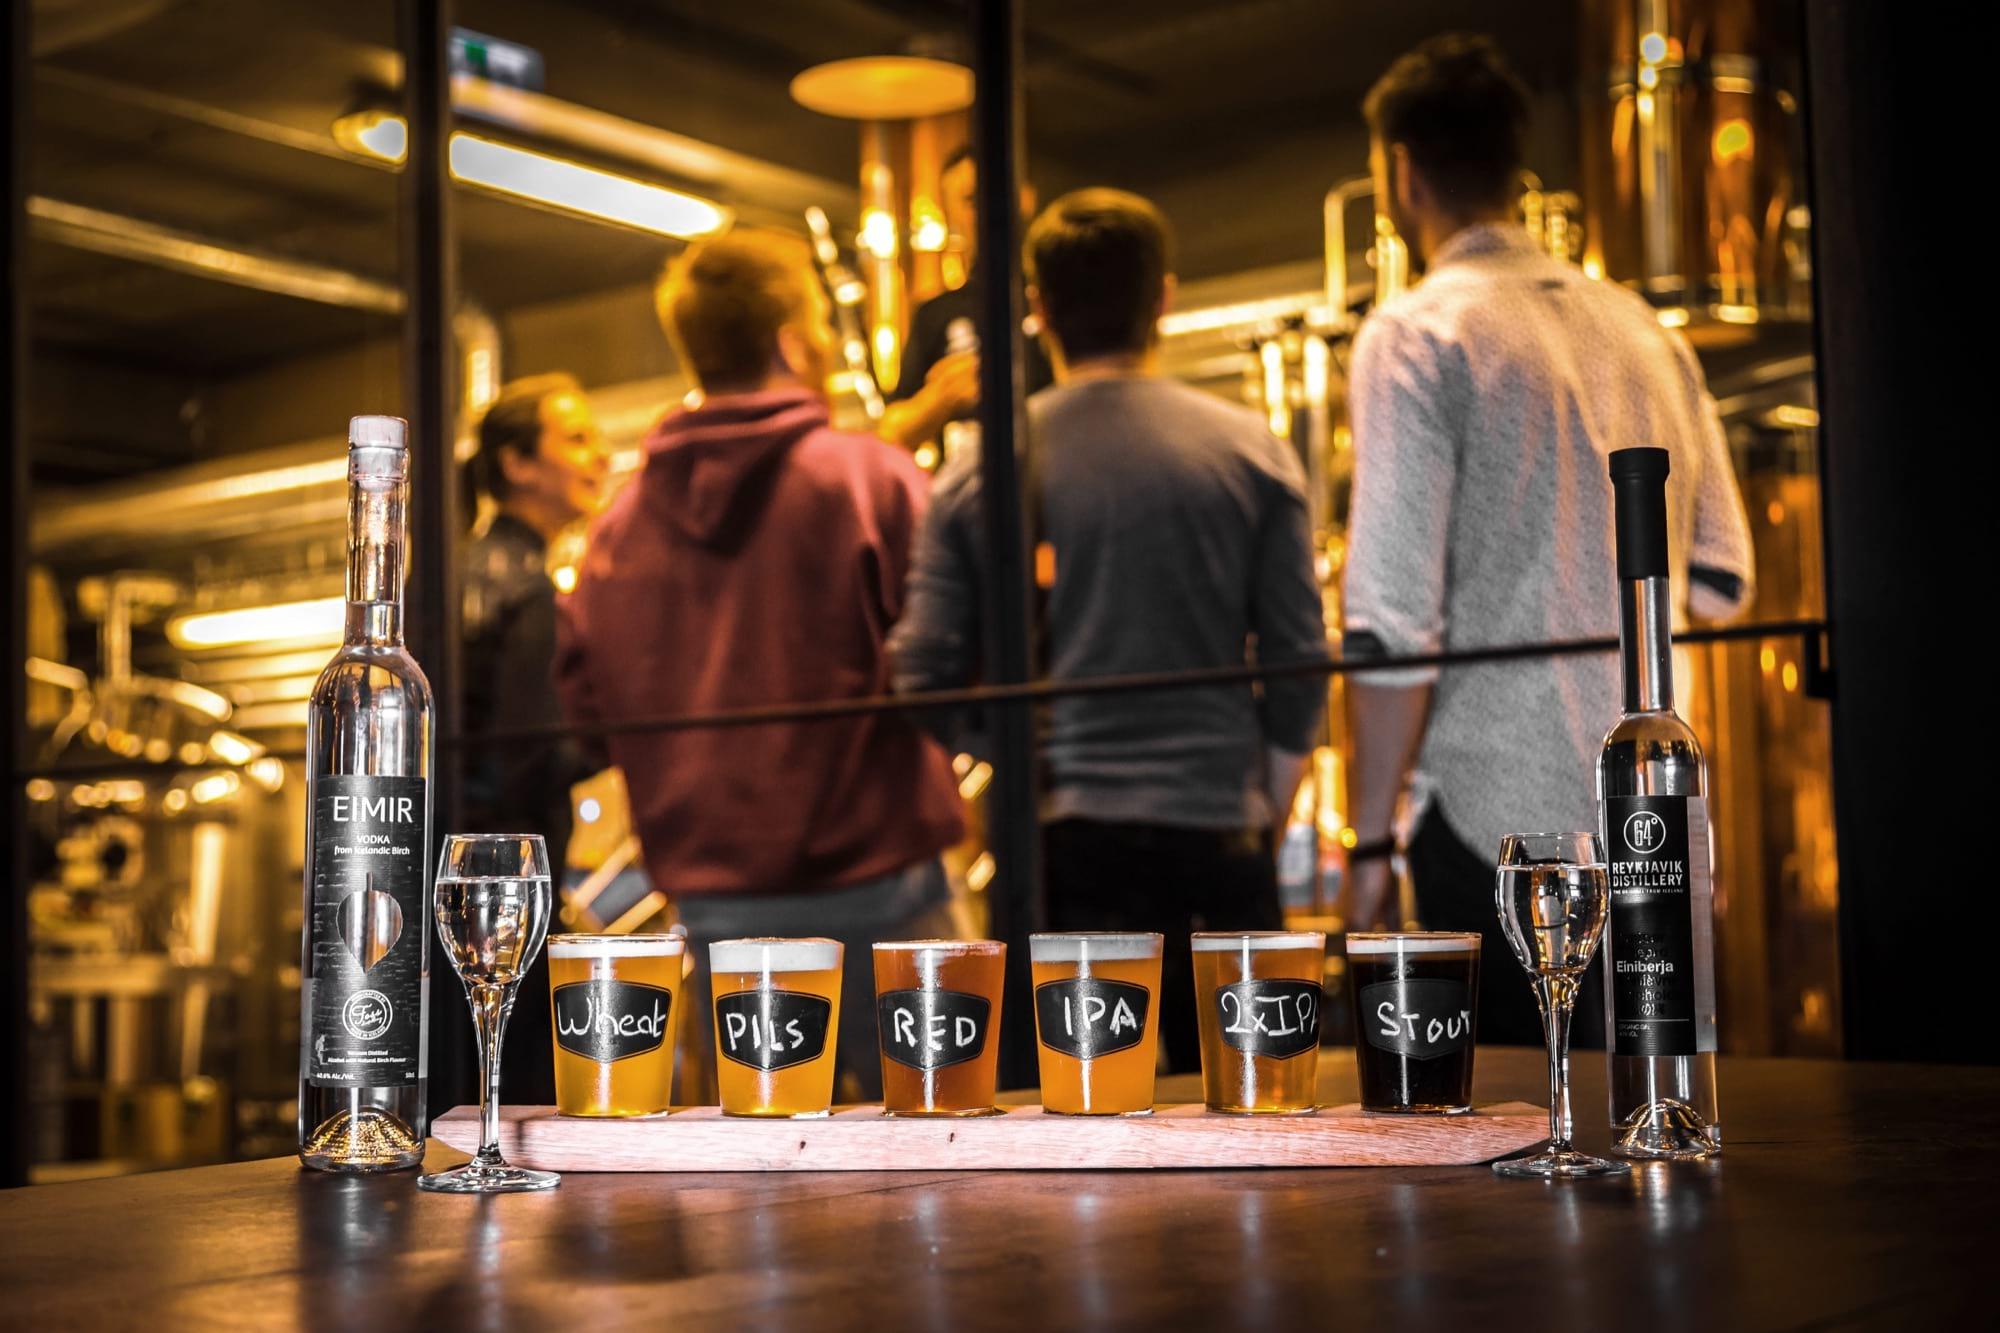 Beers_and_liquors_Bryggjan_Brugghus-min_1.jpg